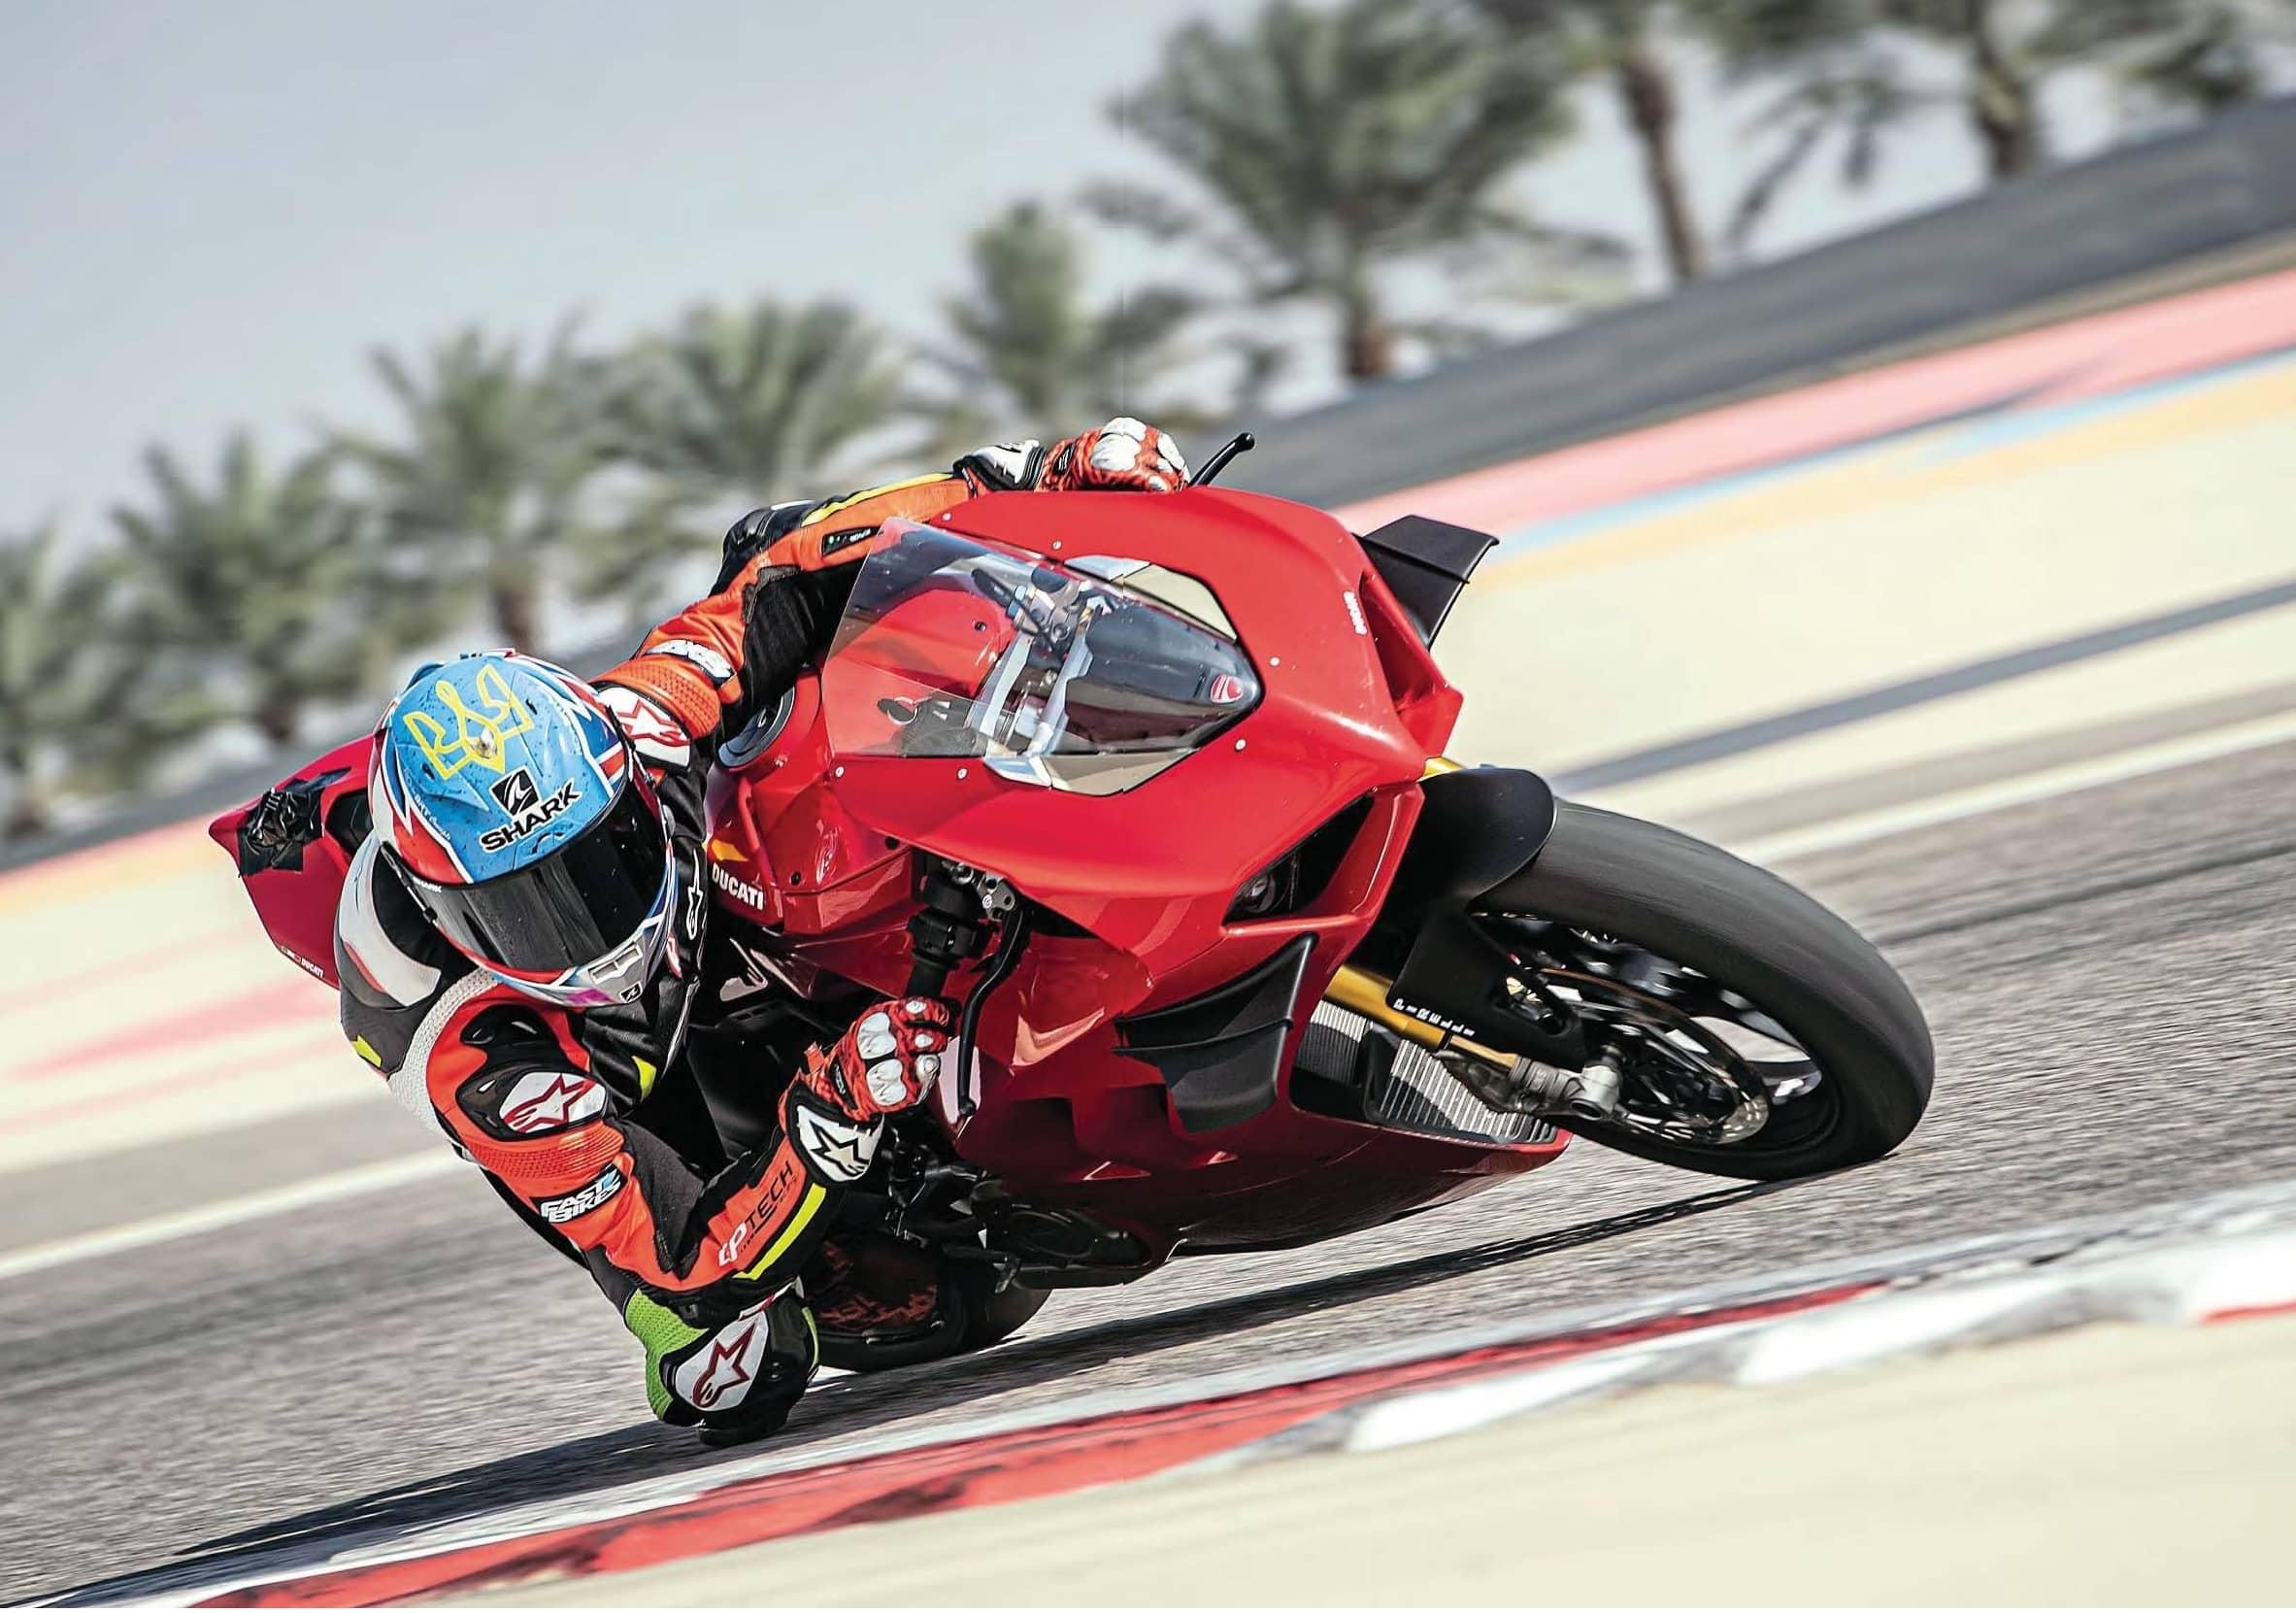 2020 Ducati Panigale V4S Refined Rocket